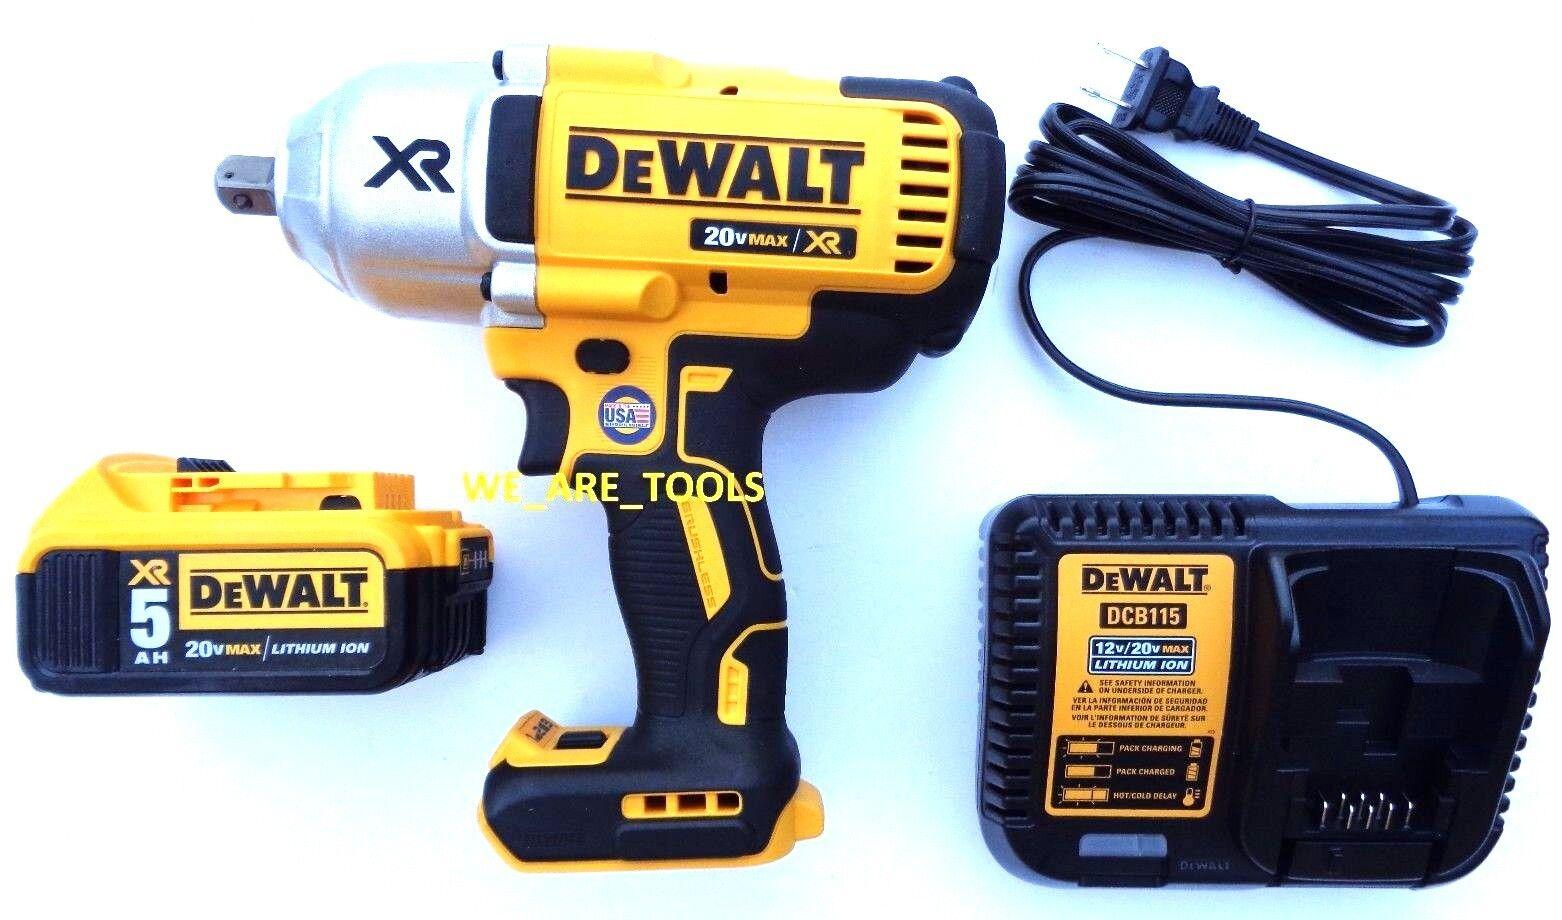 Dewalt DCF899B 20V MAX XR Cordless Lithium-Ion 1/2 in. Brush